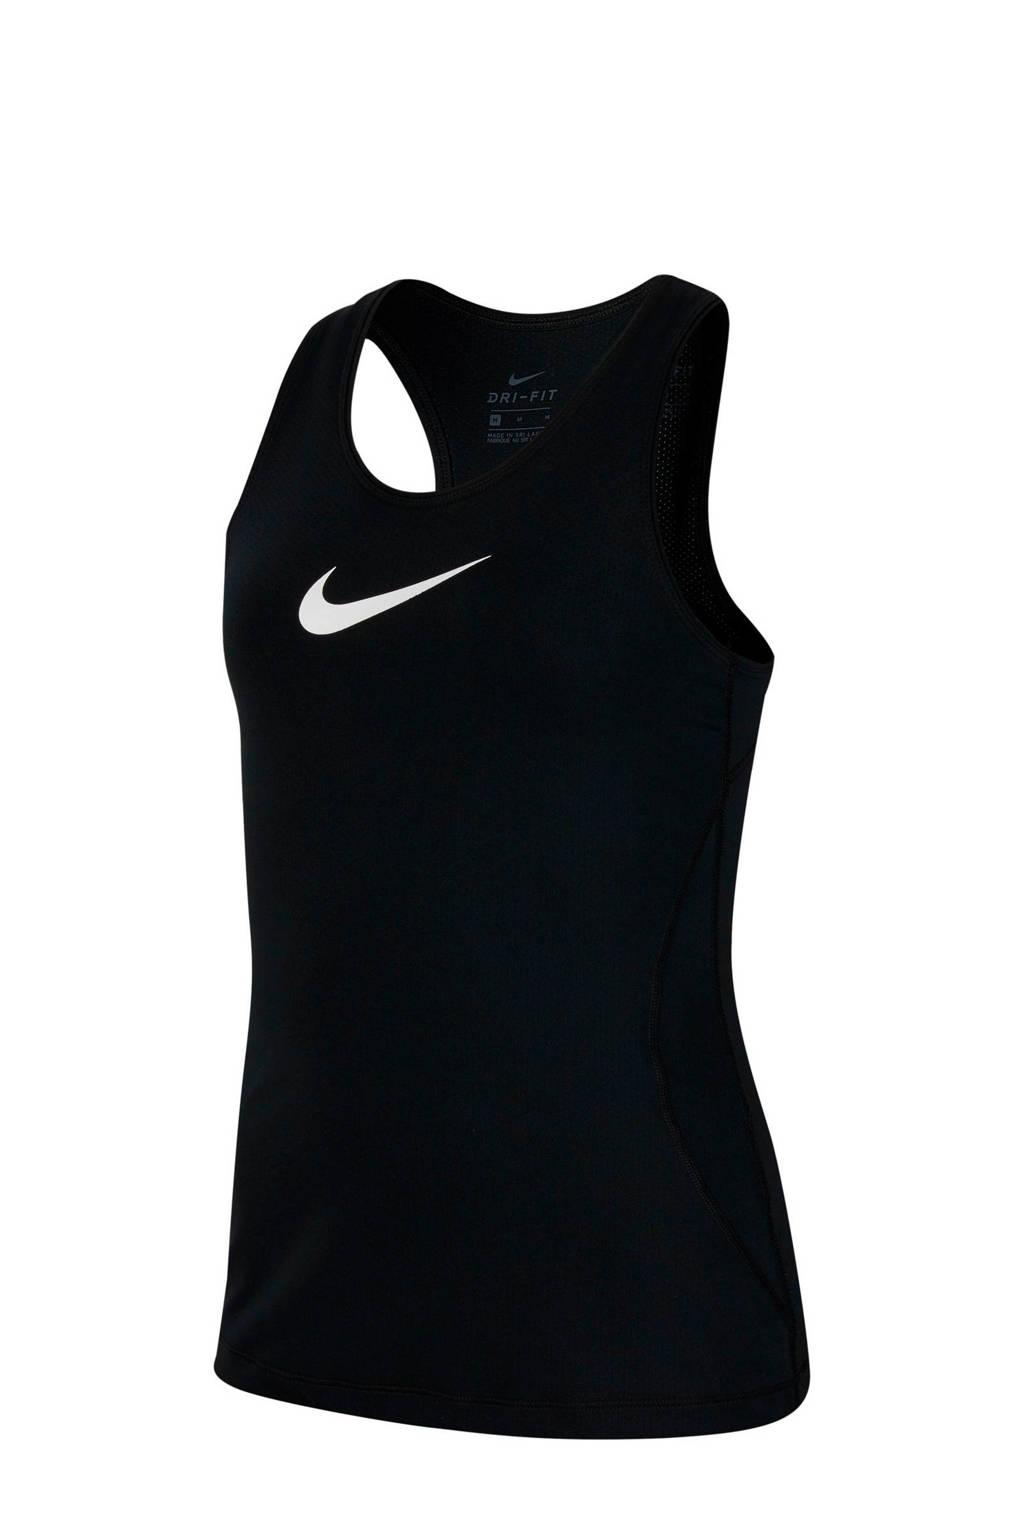 Nike top zwart, Zwart